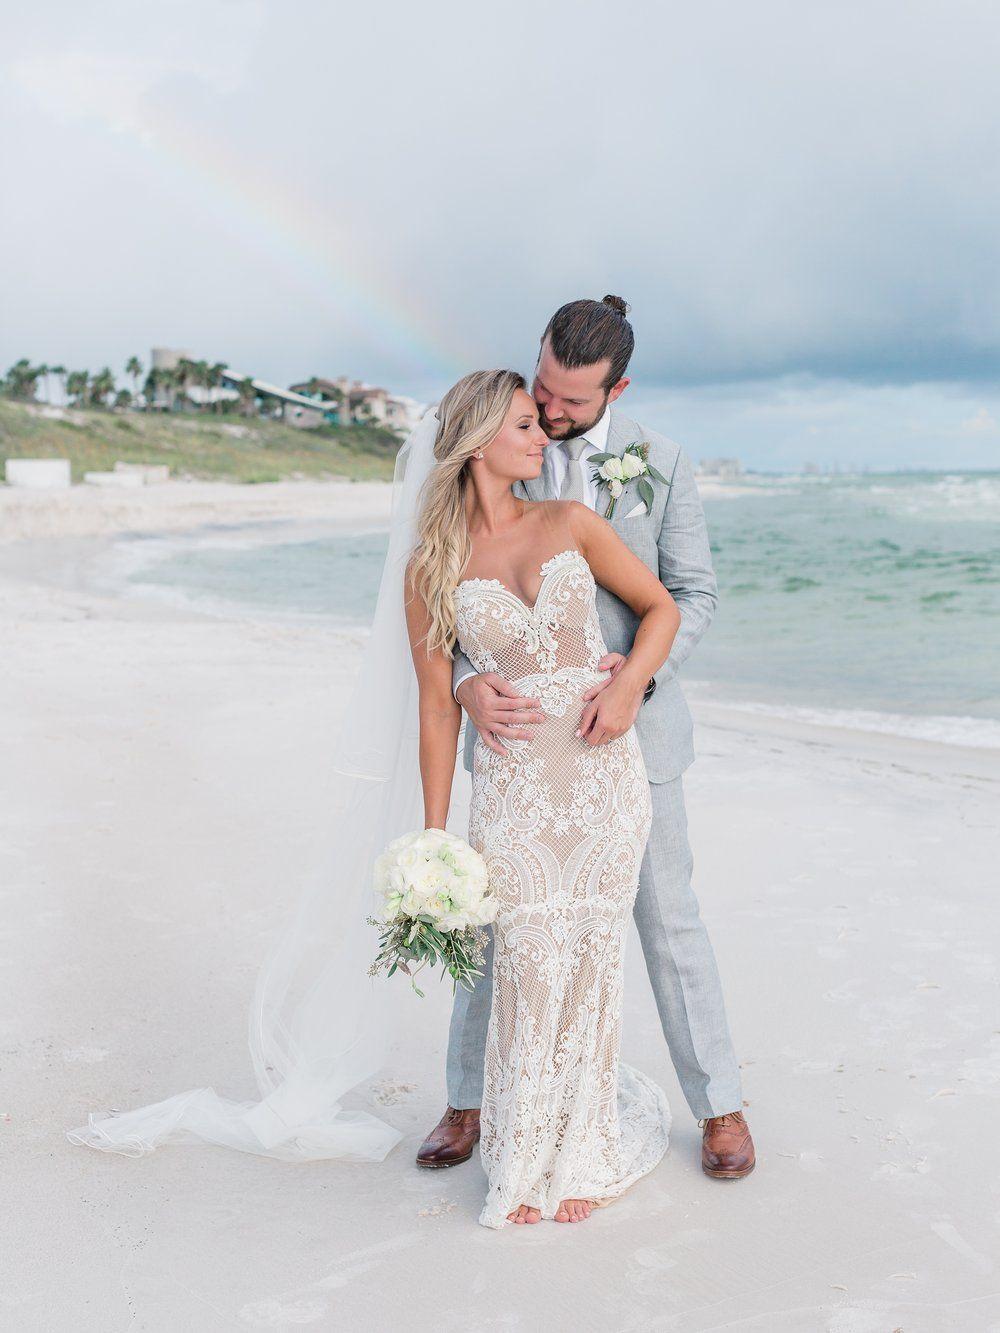 Photo of Zuzanna + Cole – Romantic Pastel Destination Wedding at Alys Beach Florida – Alys and Rosemary Beach Wedding Photographer – jessiebarksdale.com